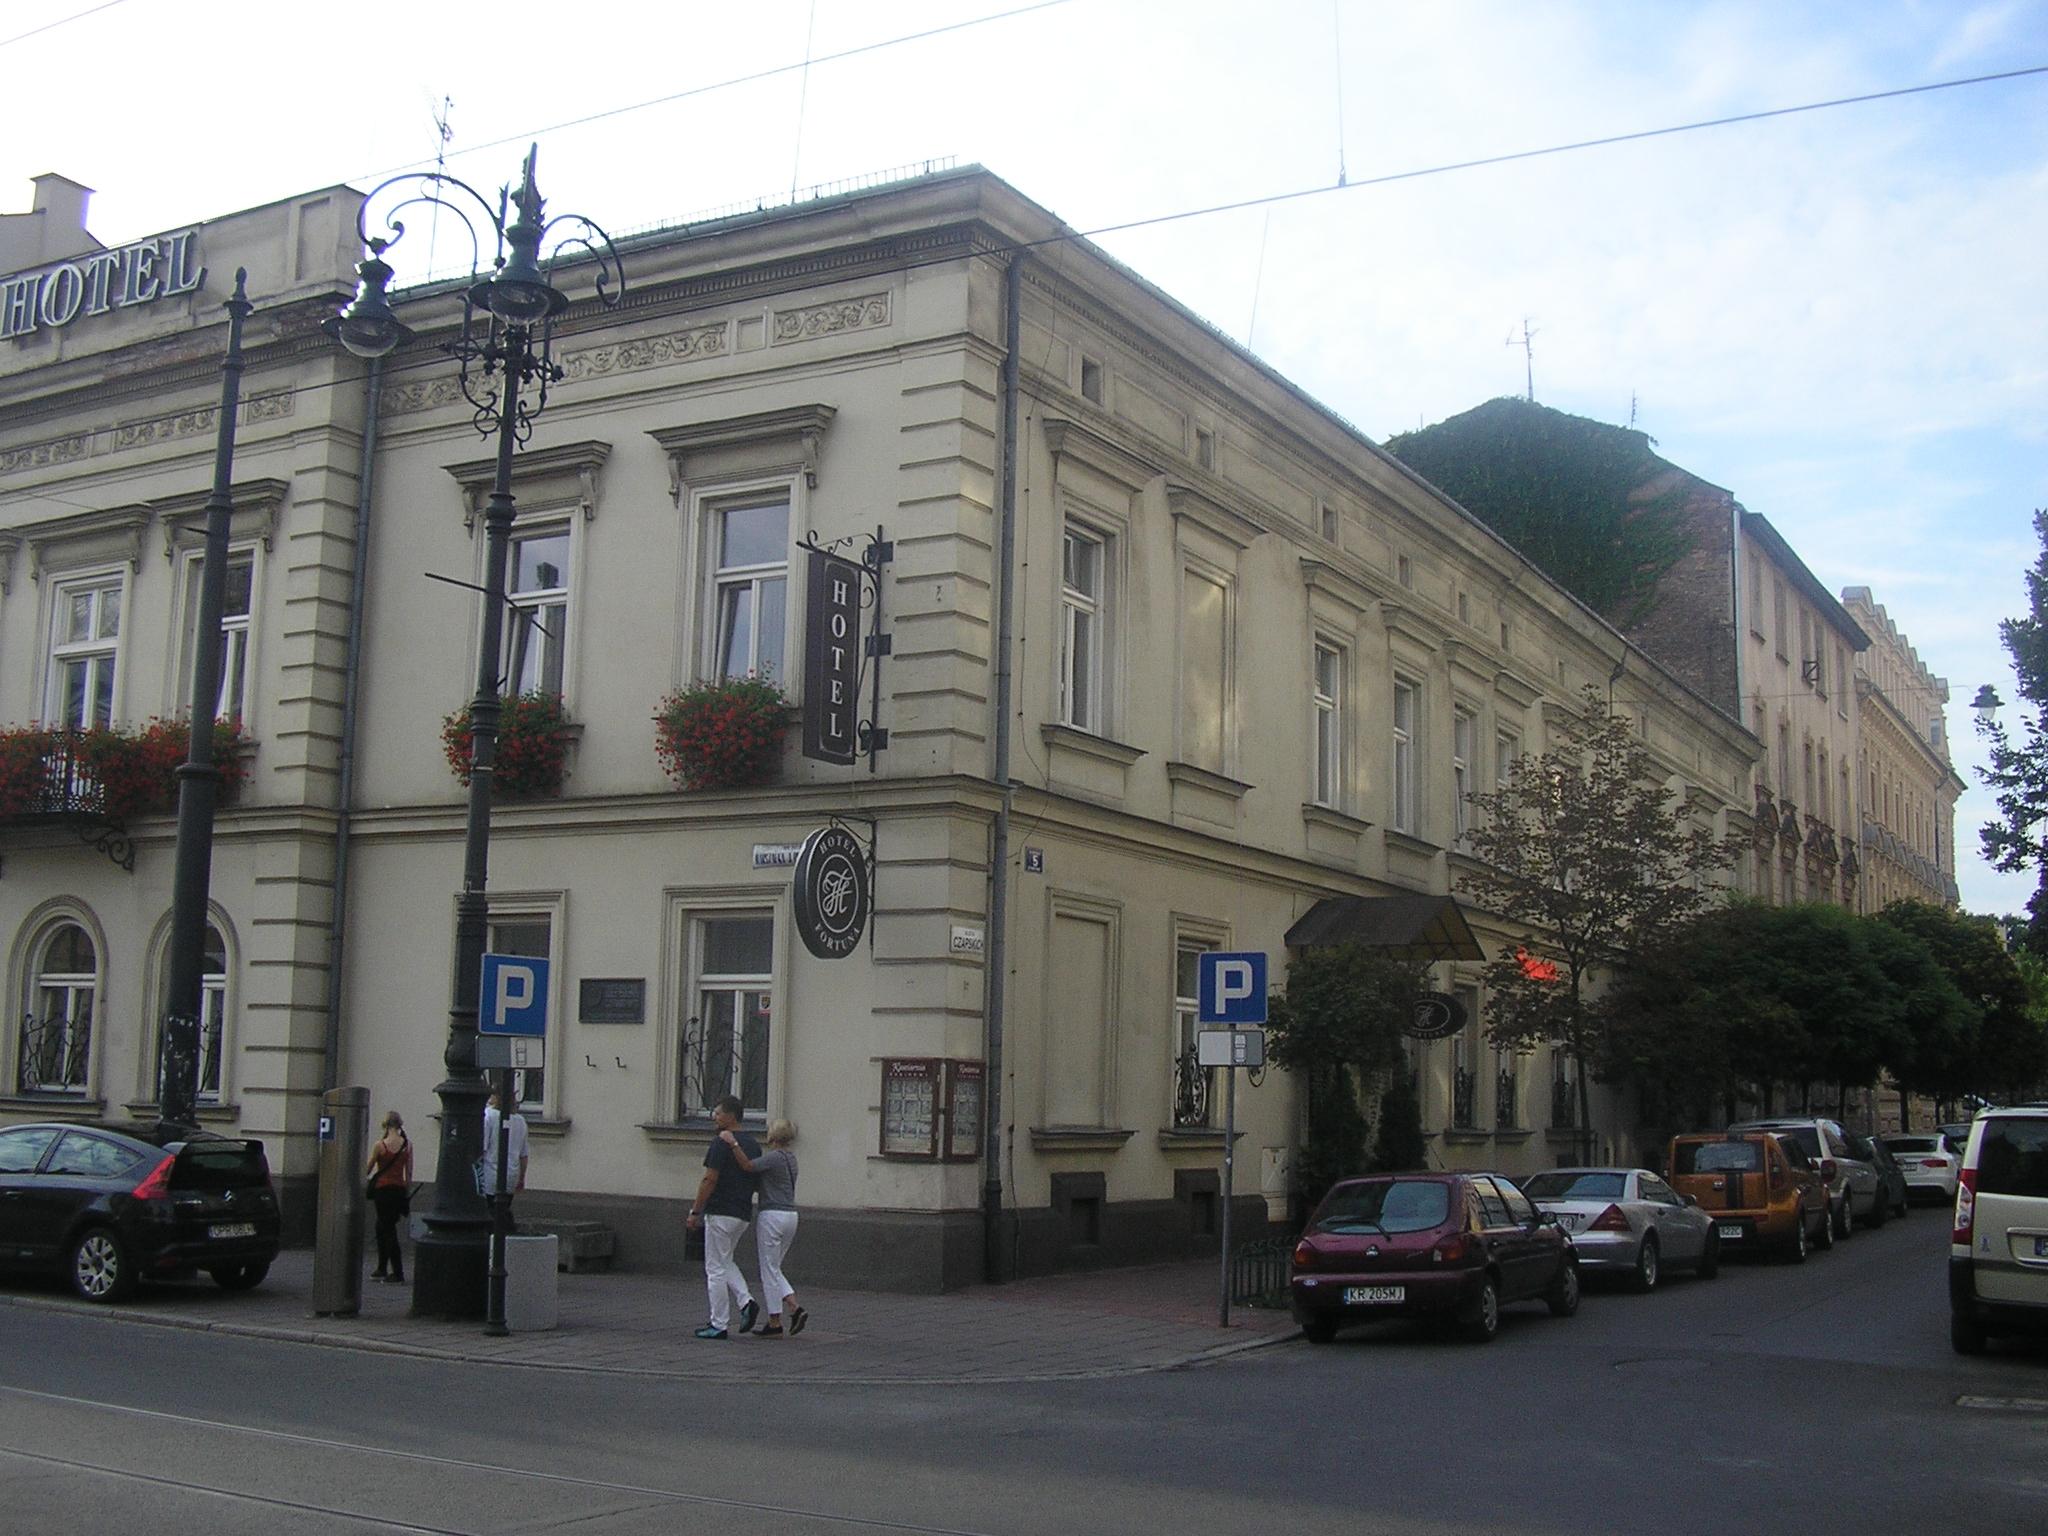 File Fortuna Hotel In Krakow 2014 Bk04 Jpg Wikimedia Commons